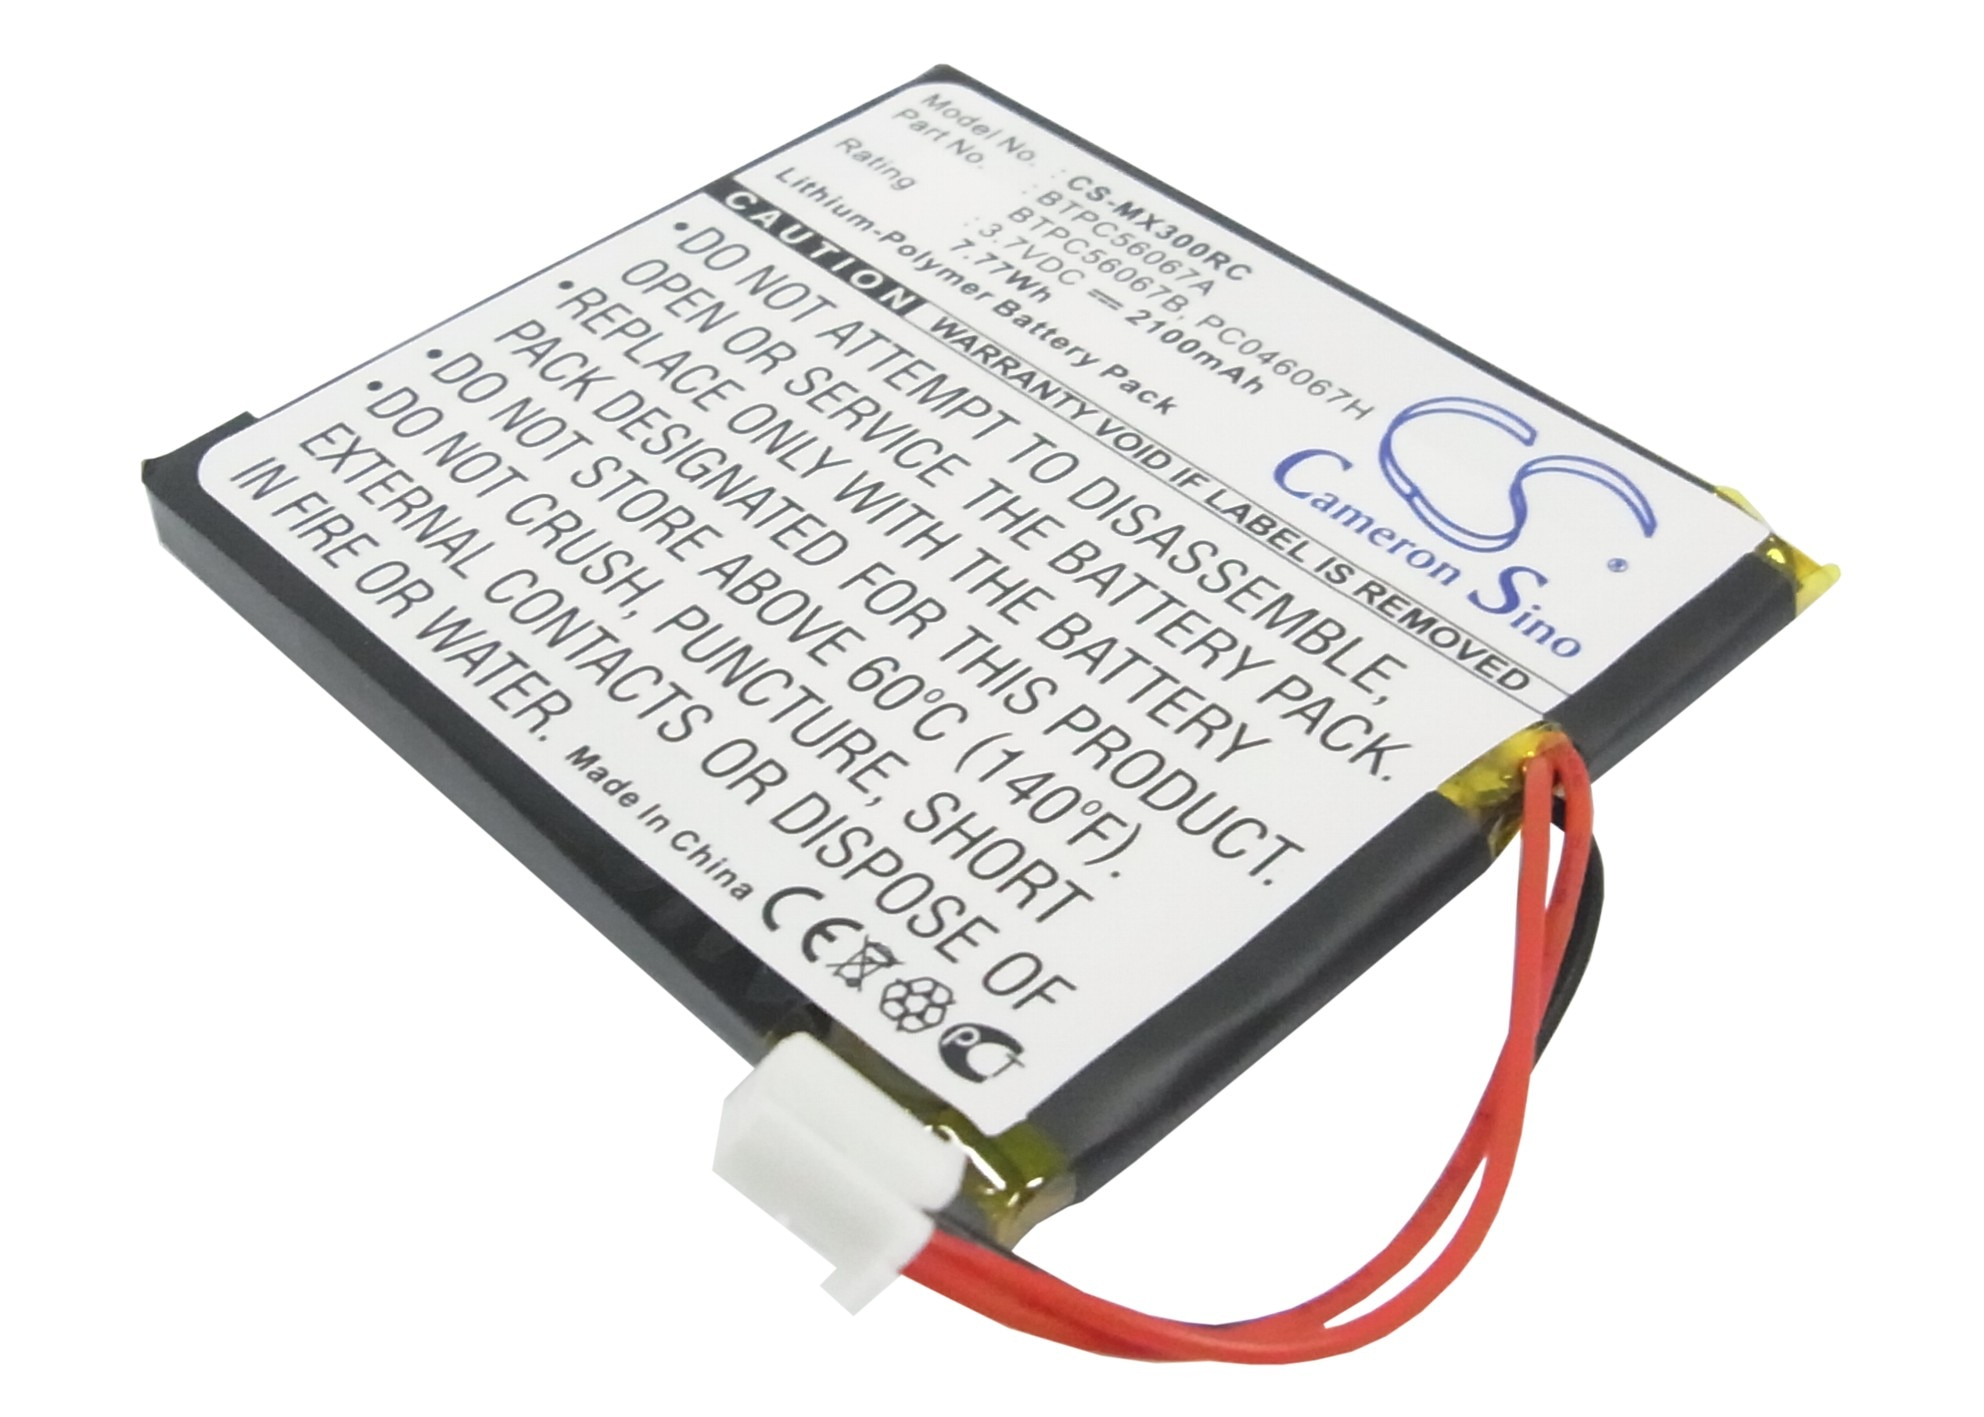 Cameron Sino для Crestron MT-1000C MiniTouch беспроводной Ha,MT-1000C-DS,STX-1700C,TPS-4L литий-полимерный